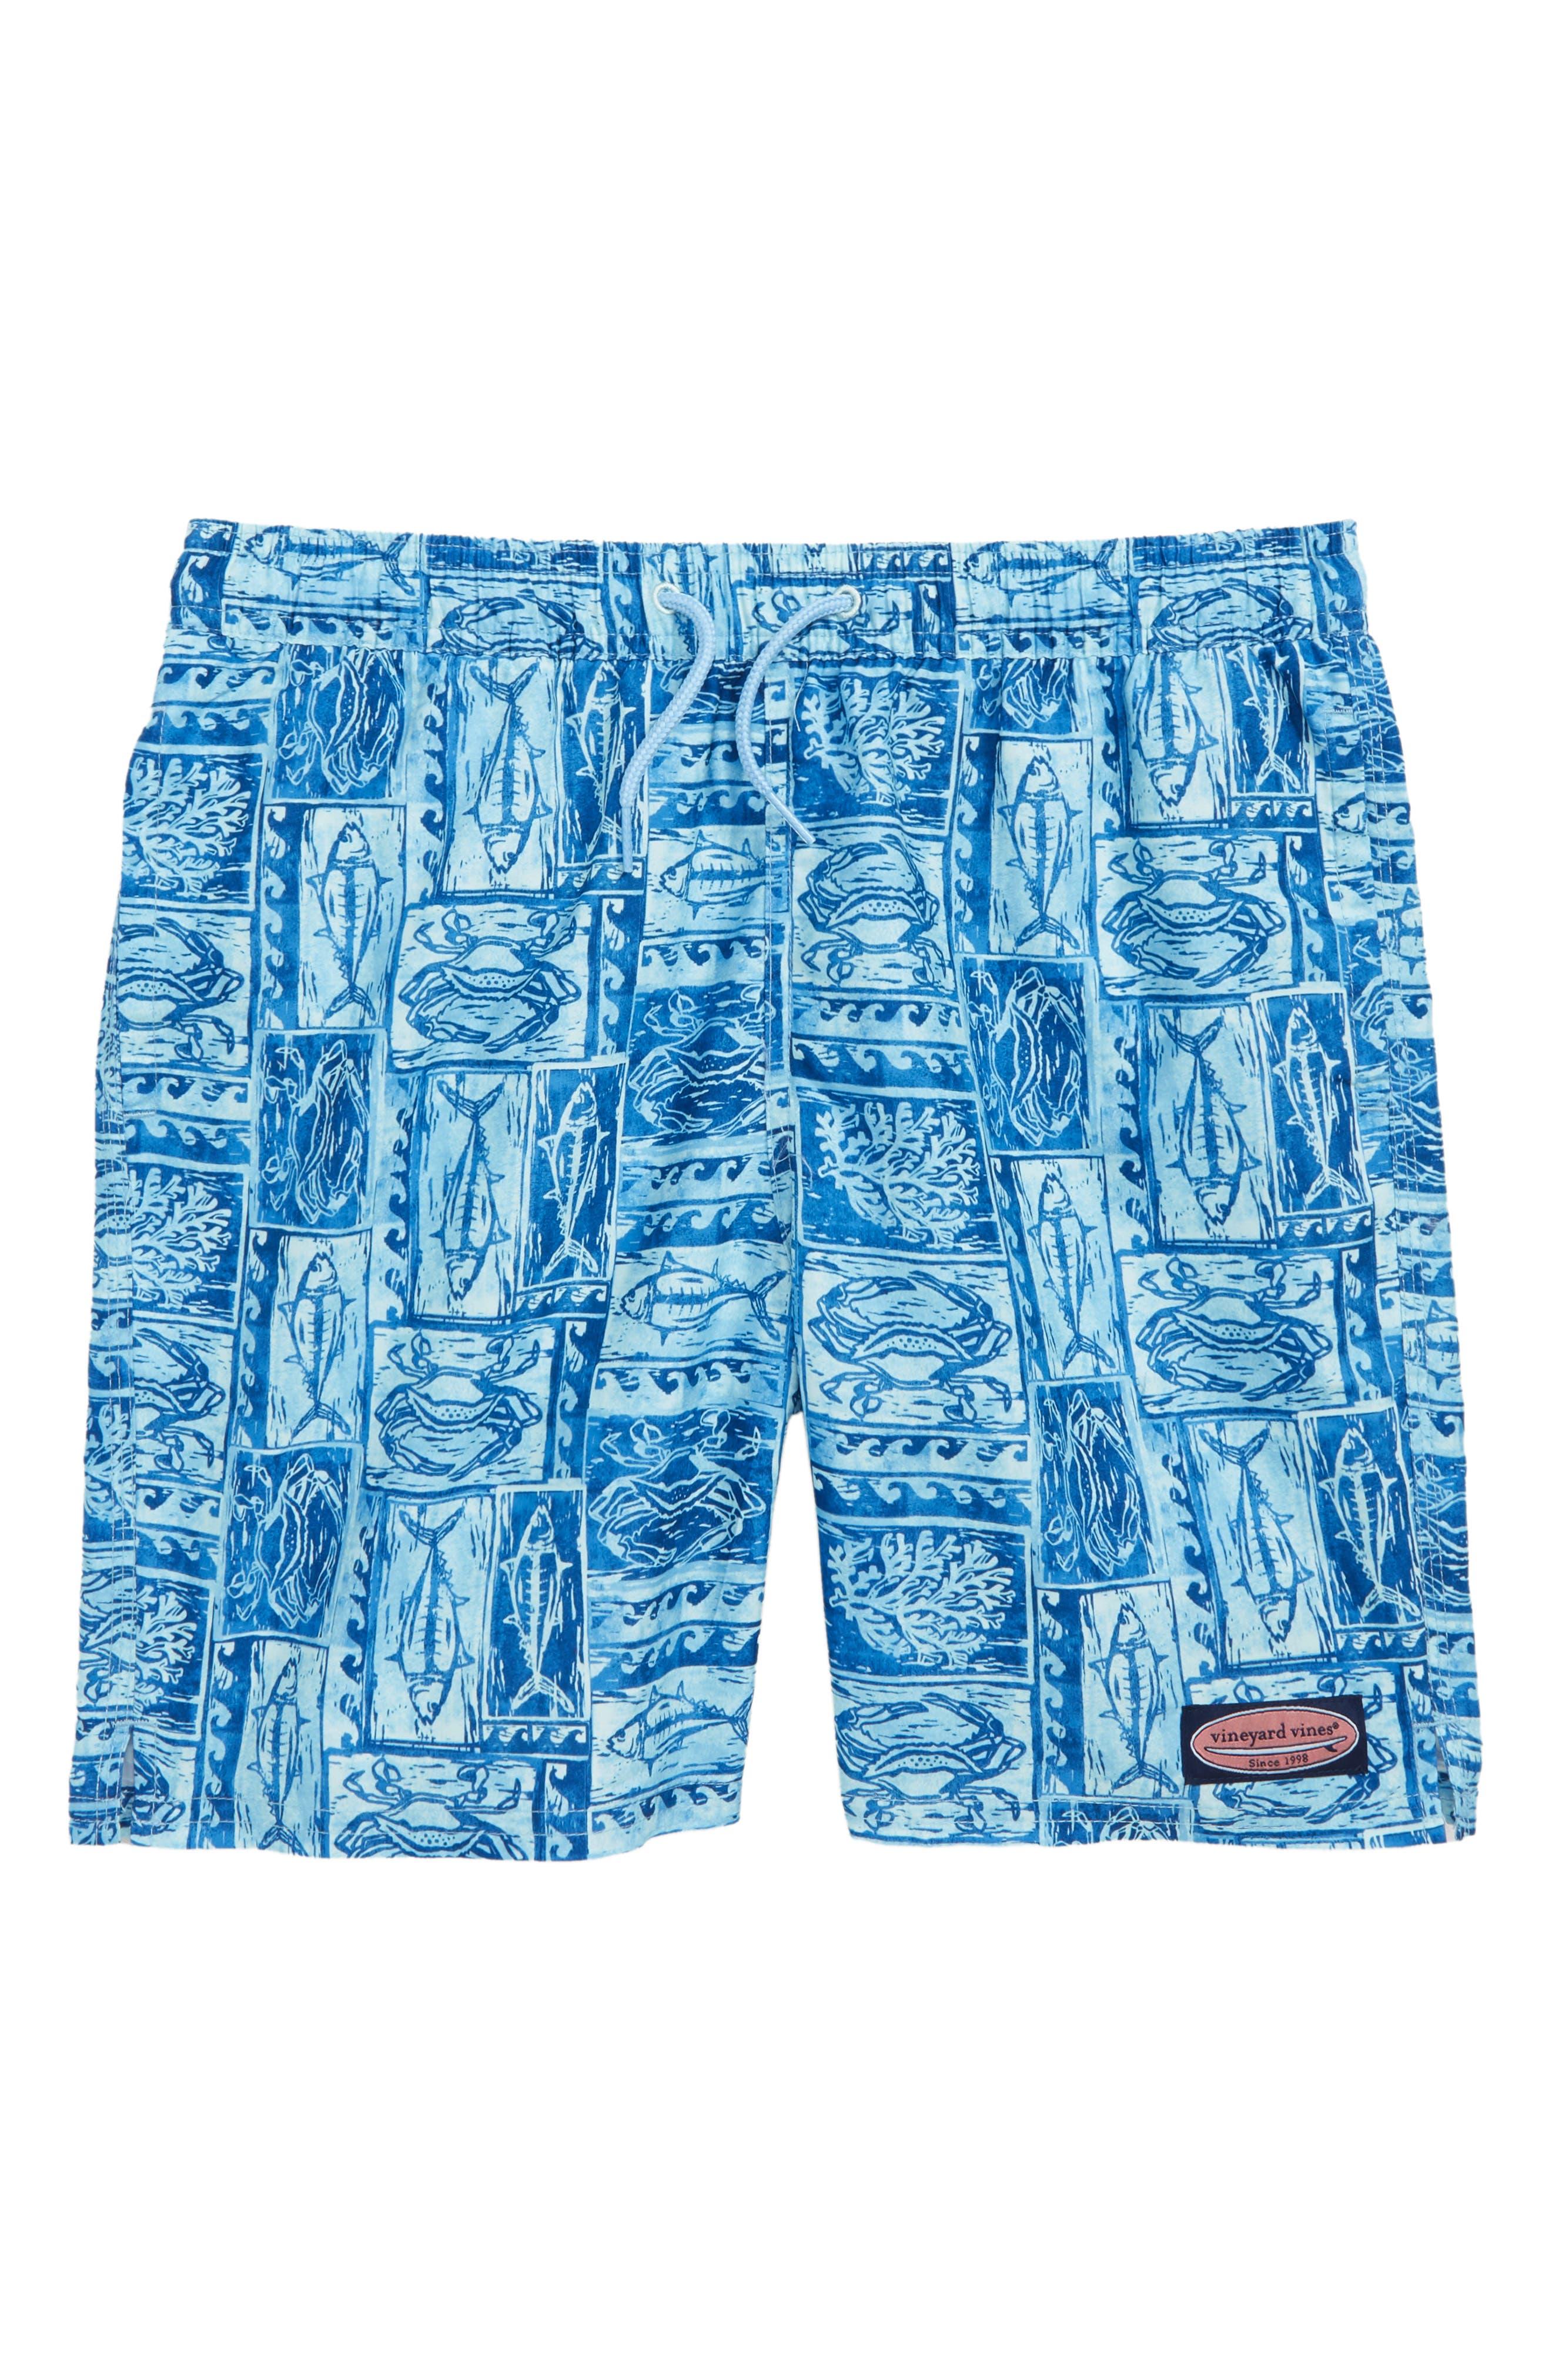 Chappy Woodblock Sea Life Swim Trunks,                             Main thumbnail 1, color,                             JAKE BLUE